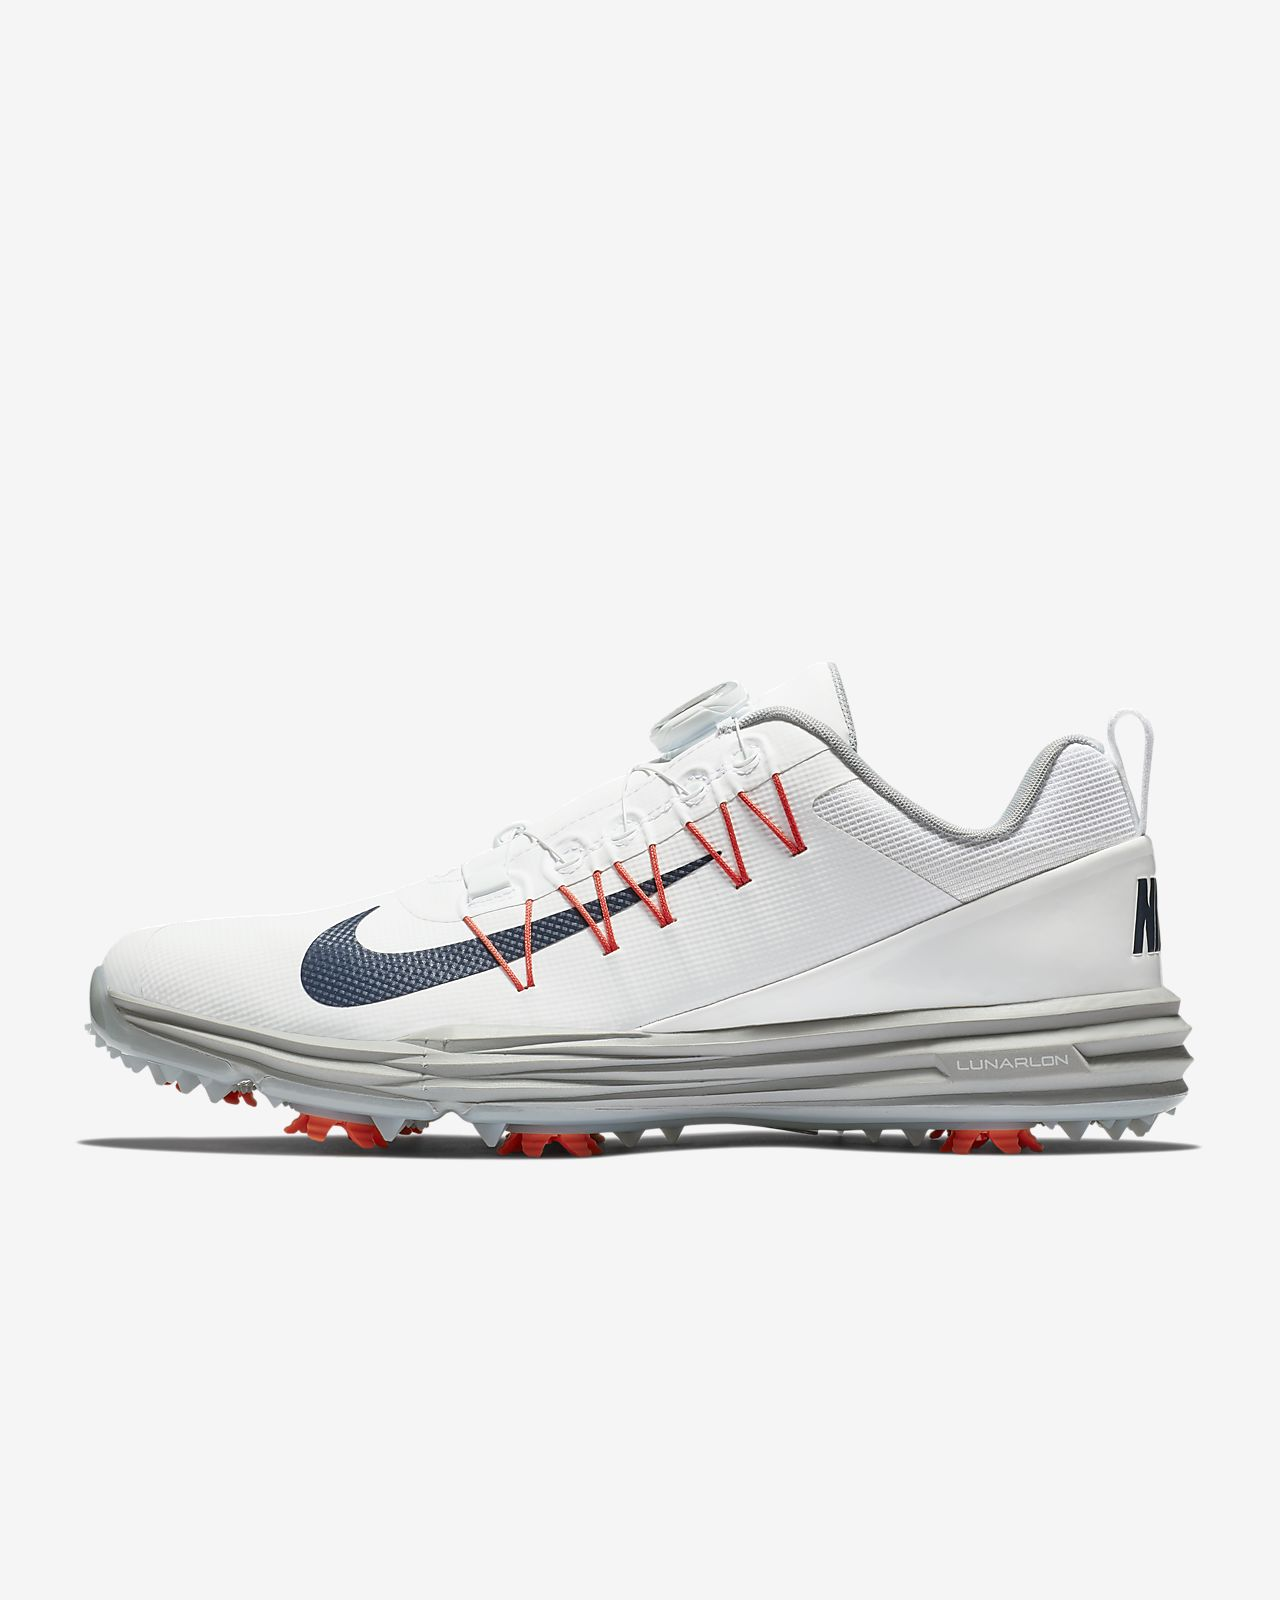 Nike Lunar Command 2Sneaker, Damen, Damen, Lunar Command 2, Blau/Grün, 36,5